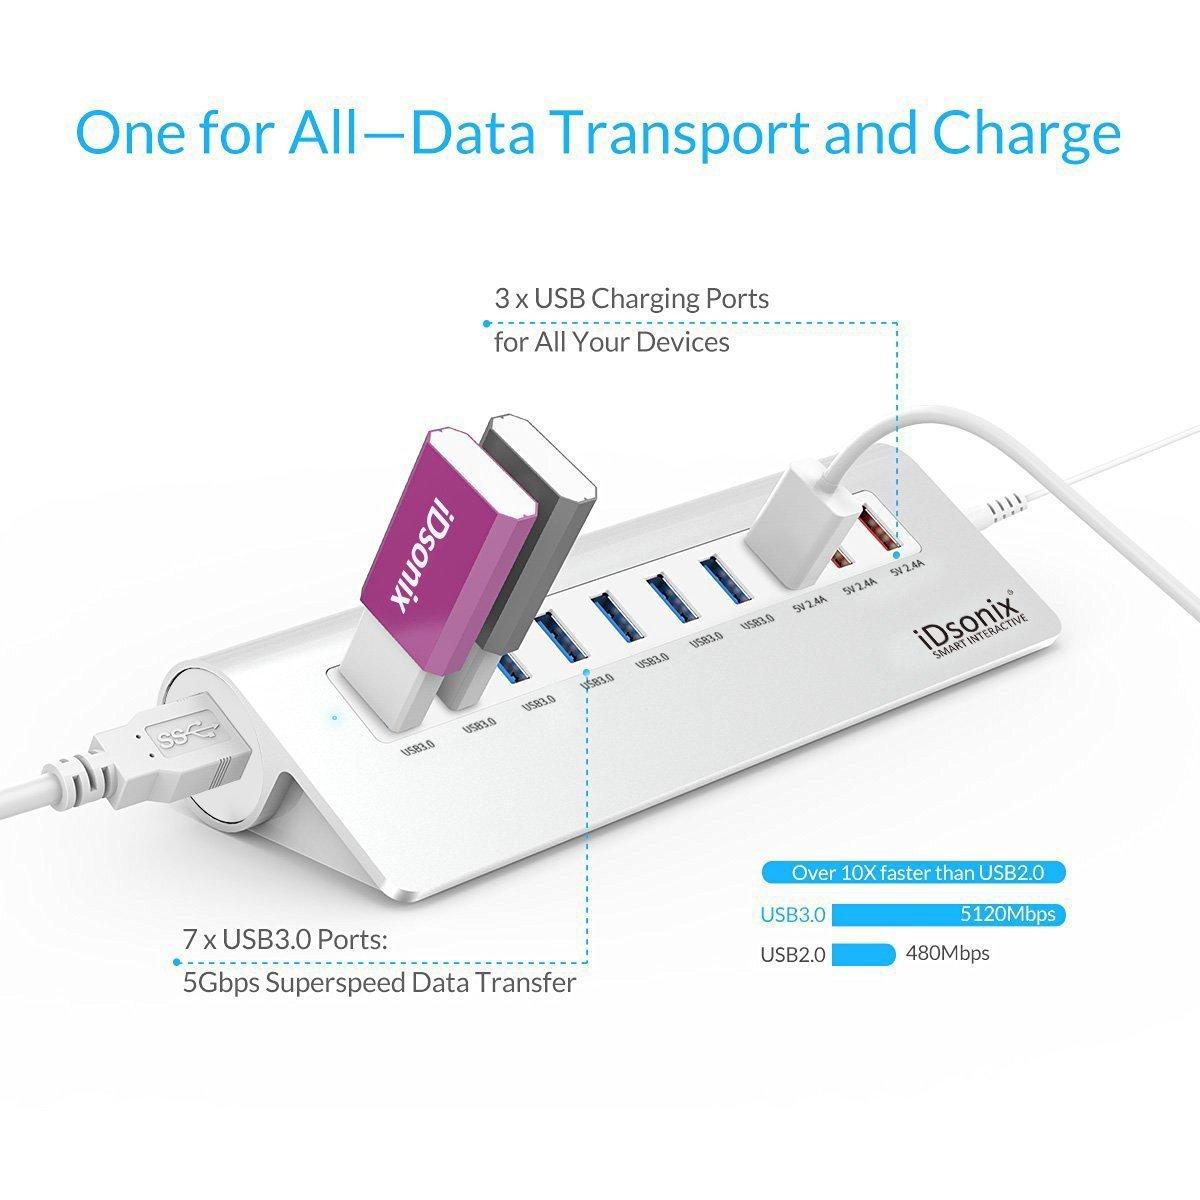 iDsonix 10 Port USB 3.0 Hub Aluminum Desktop Hub, 7 Port USB 3.0 Hub + 3 Port Powered Multi Charging $27.99